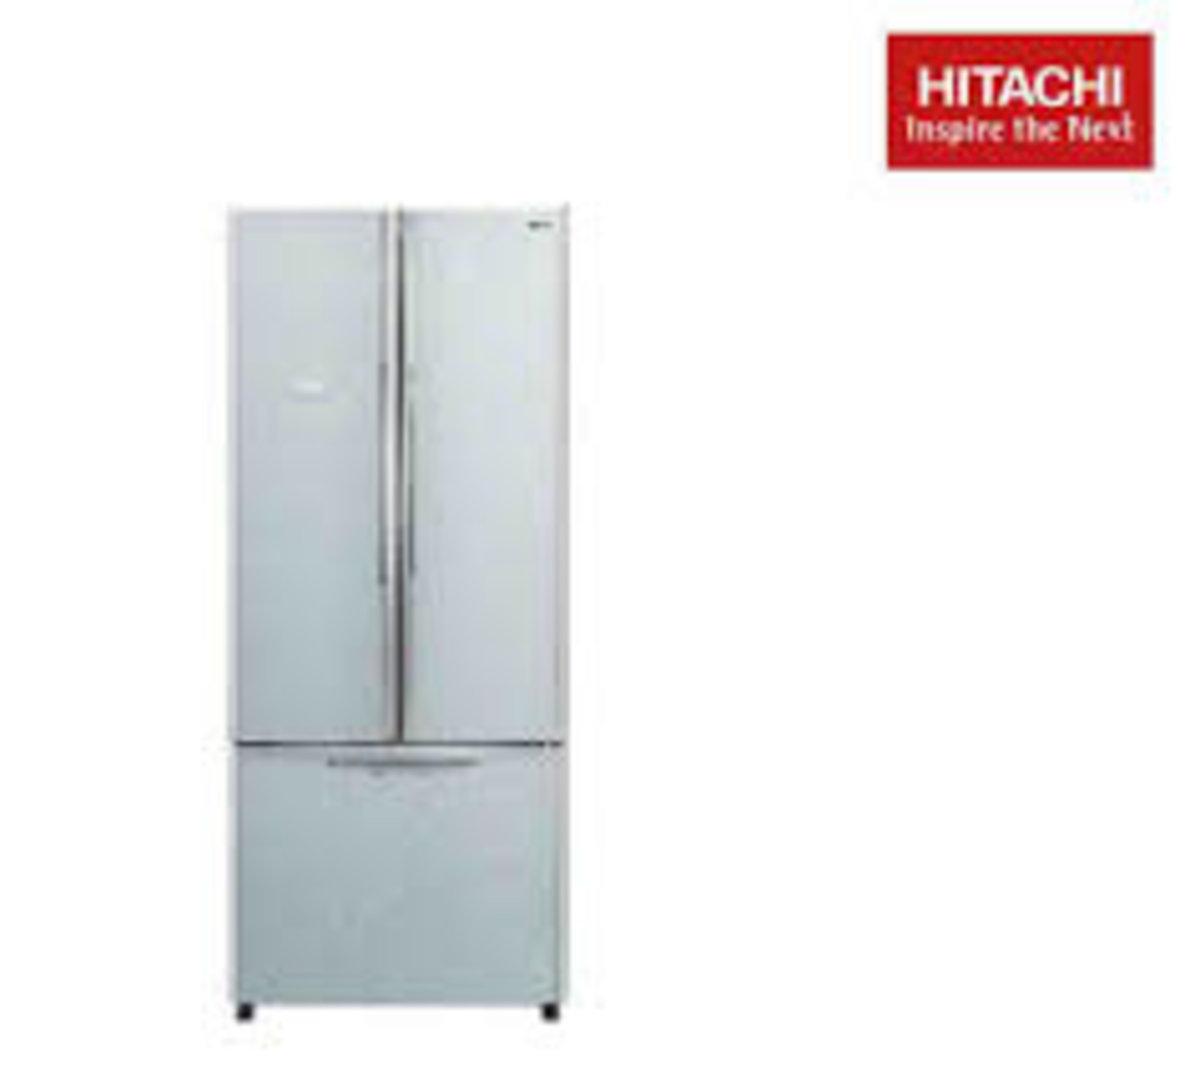 French Bottom Freezer Refrigerator 430L (Glass Silver) R-WB550P2HGS